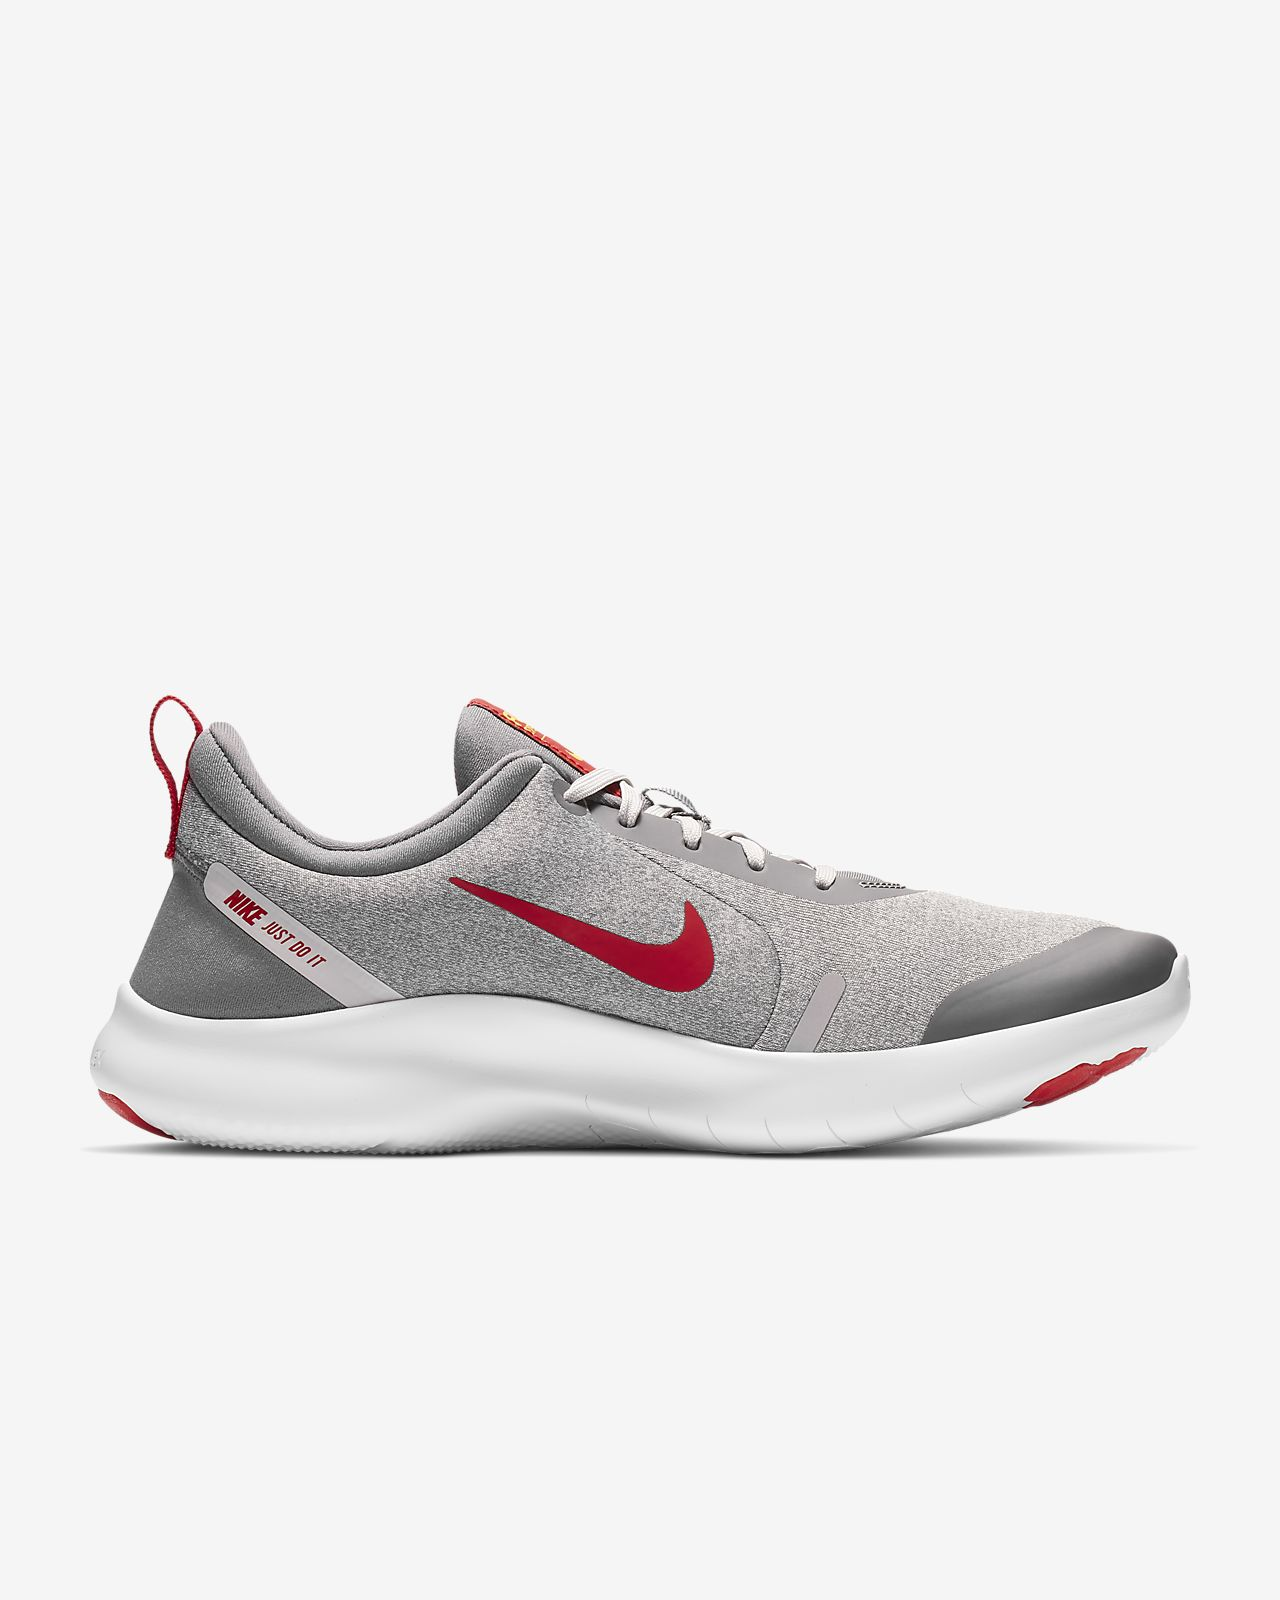 45003bd721b5e Nike Flex Experience RN 8 Men s Running Shoe. Nike.com GB